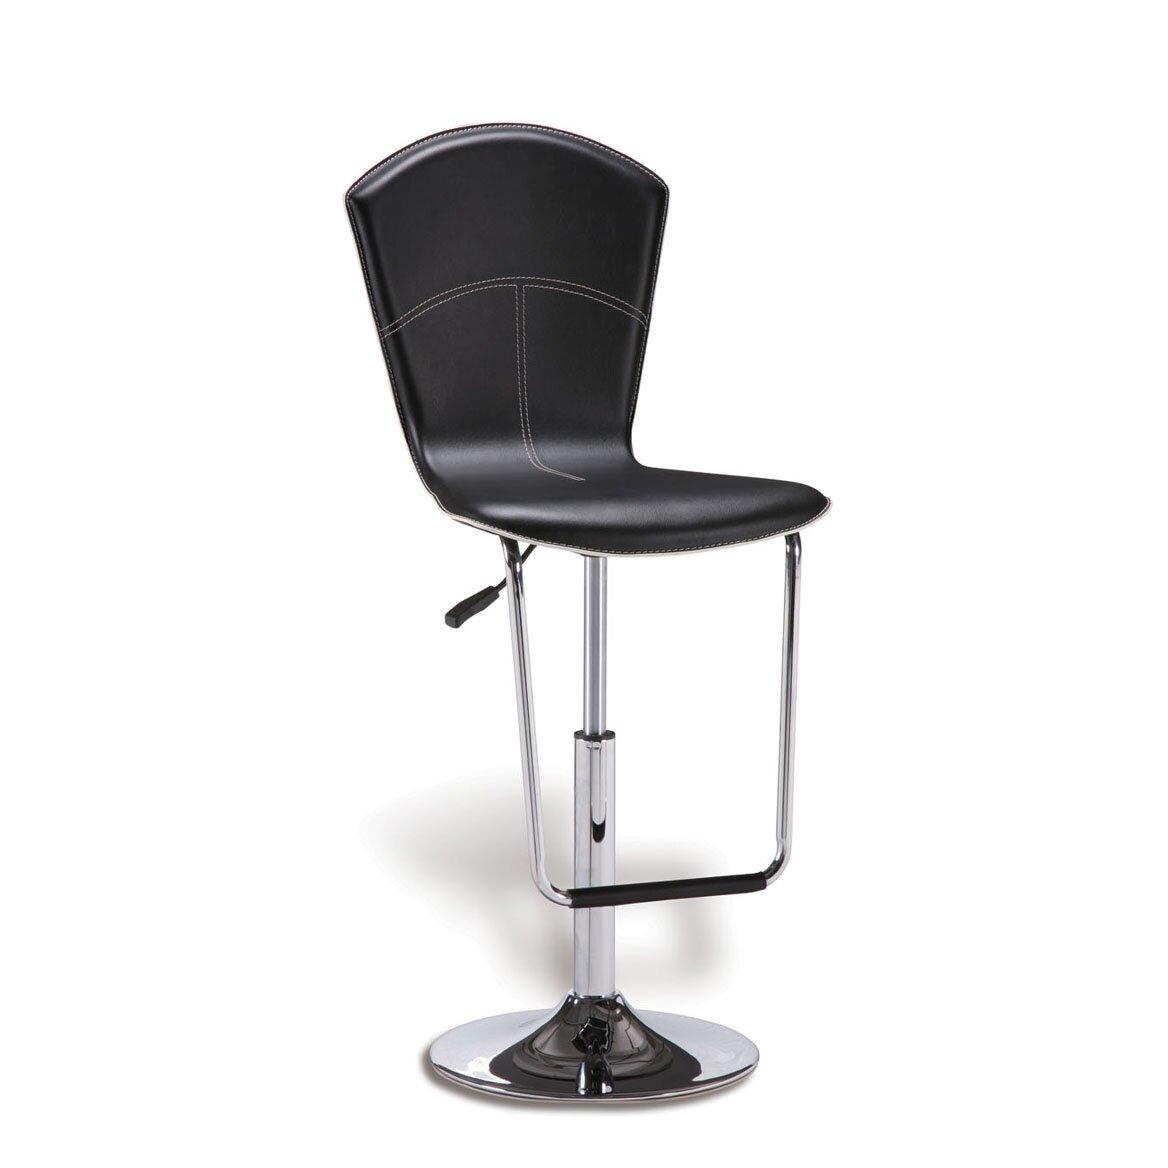 Global Furniture USA Adjustable Height Bar Stool Wayfair : Yani2BContemporary2BBarstool from www.wayfair.com size 1168 x 1168 jpeg 62kB